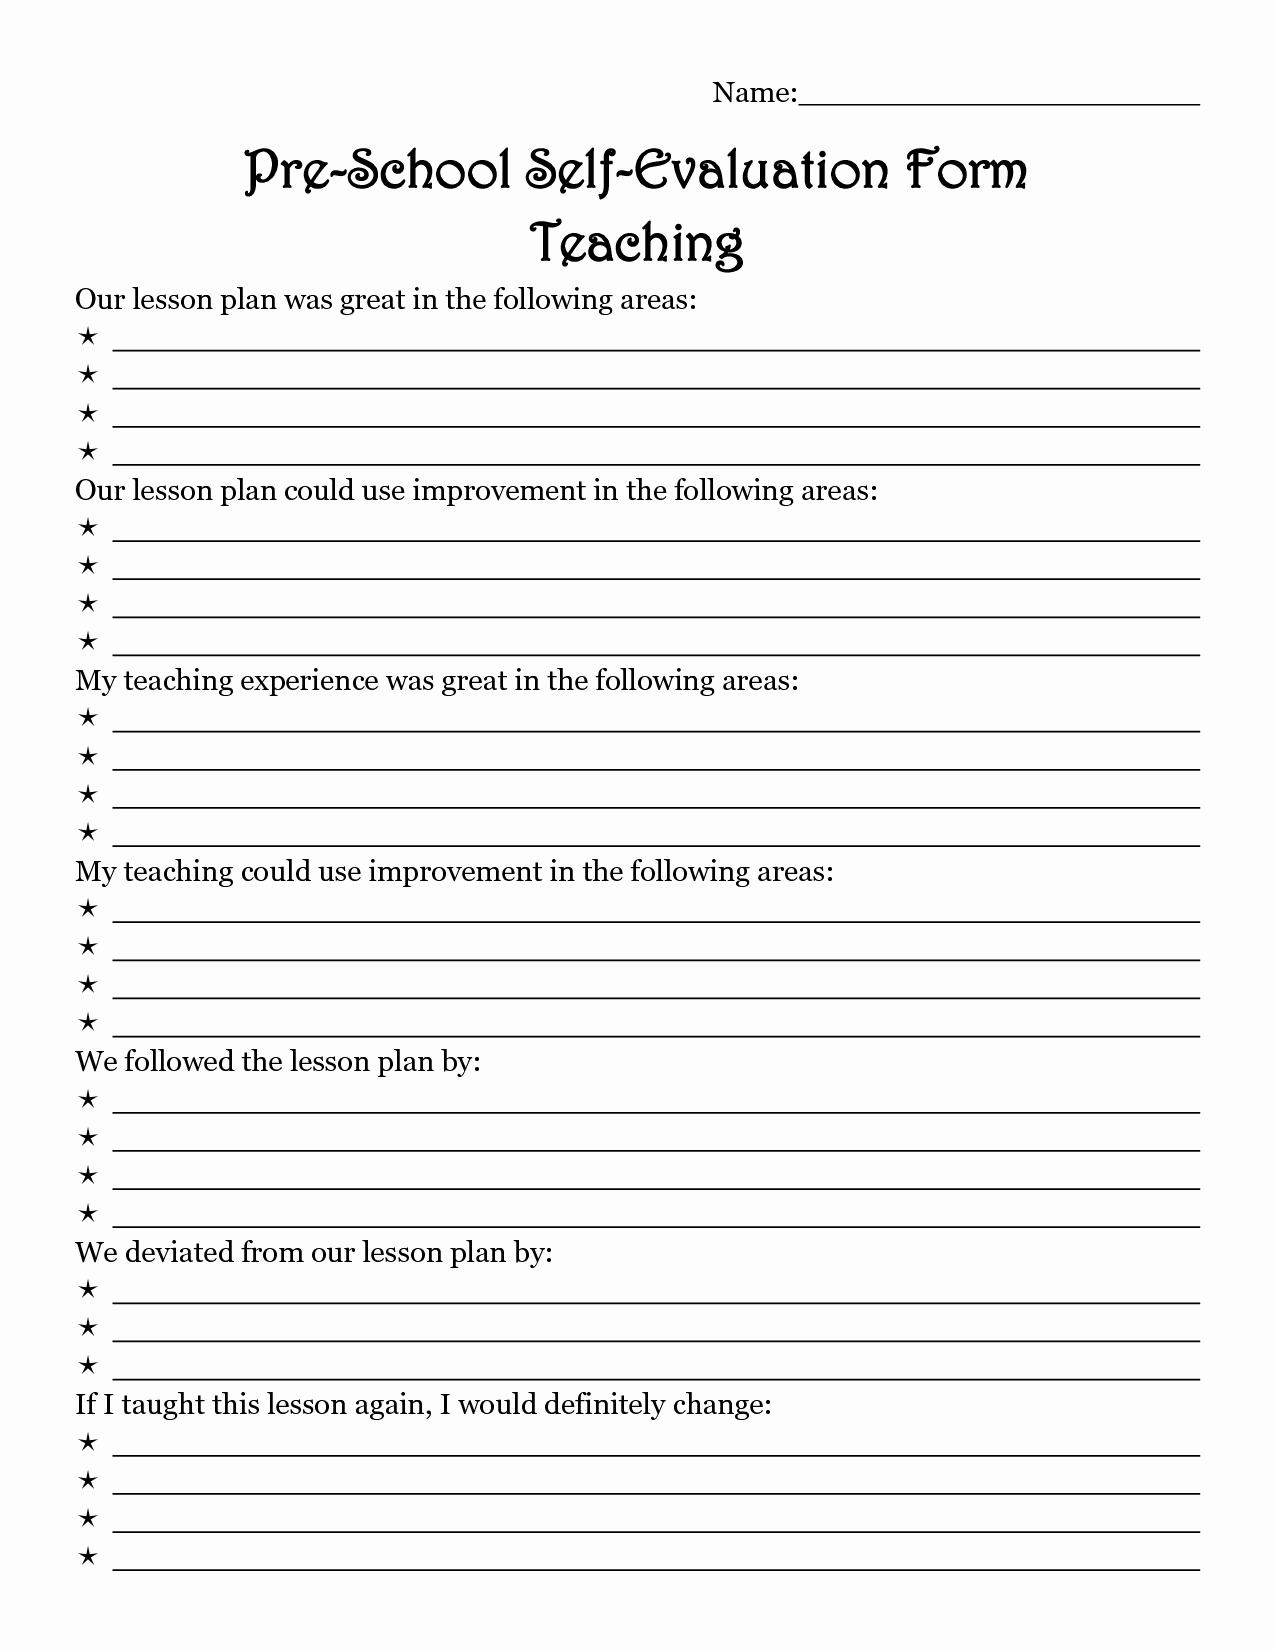 Teacher Application forms Inspirational Teacher Evaluation form Preschool Early Childhood